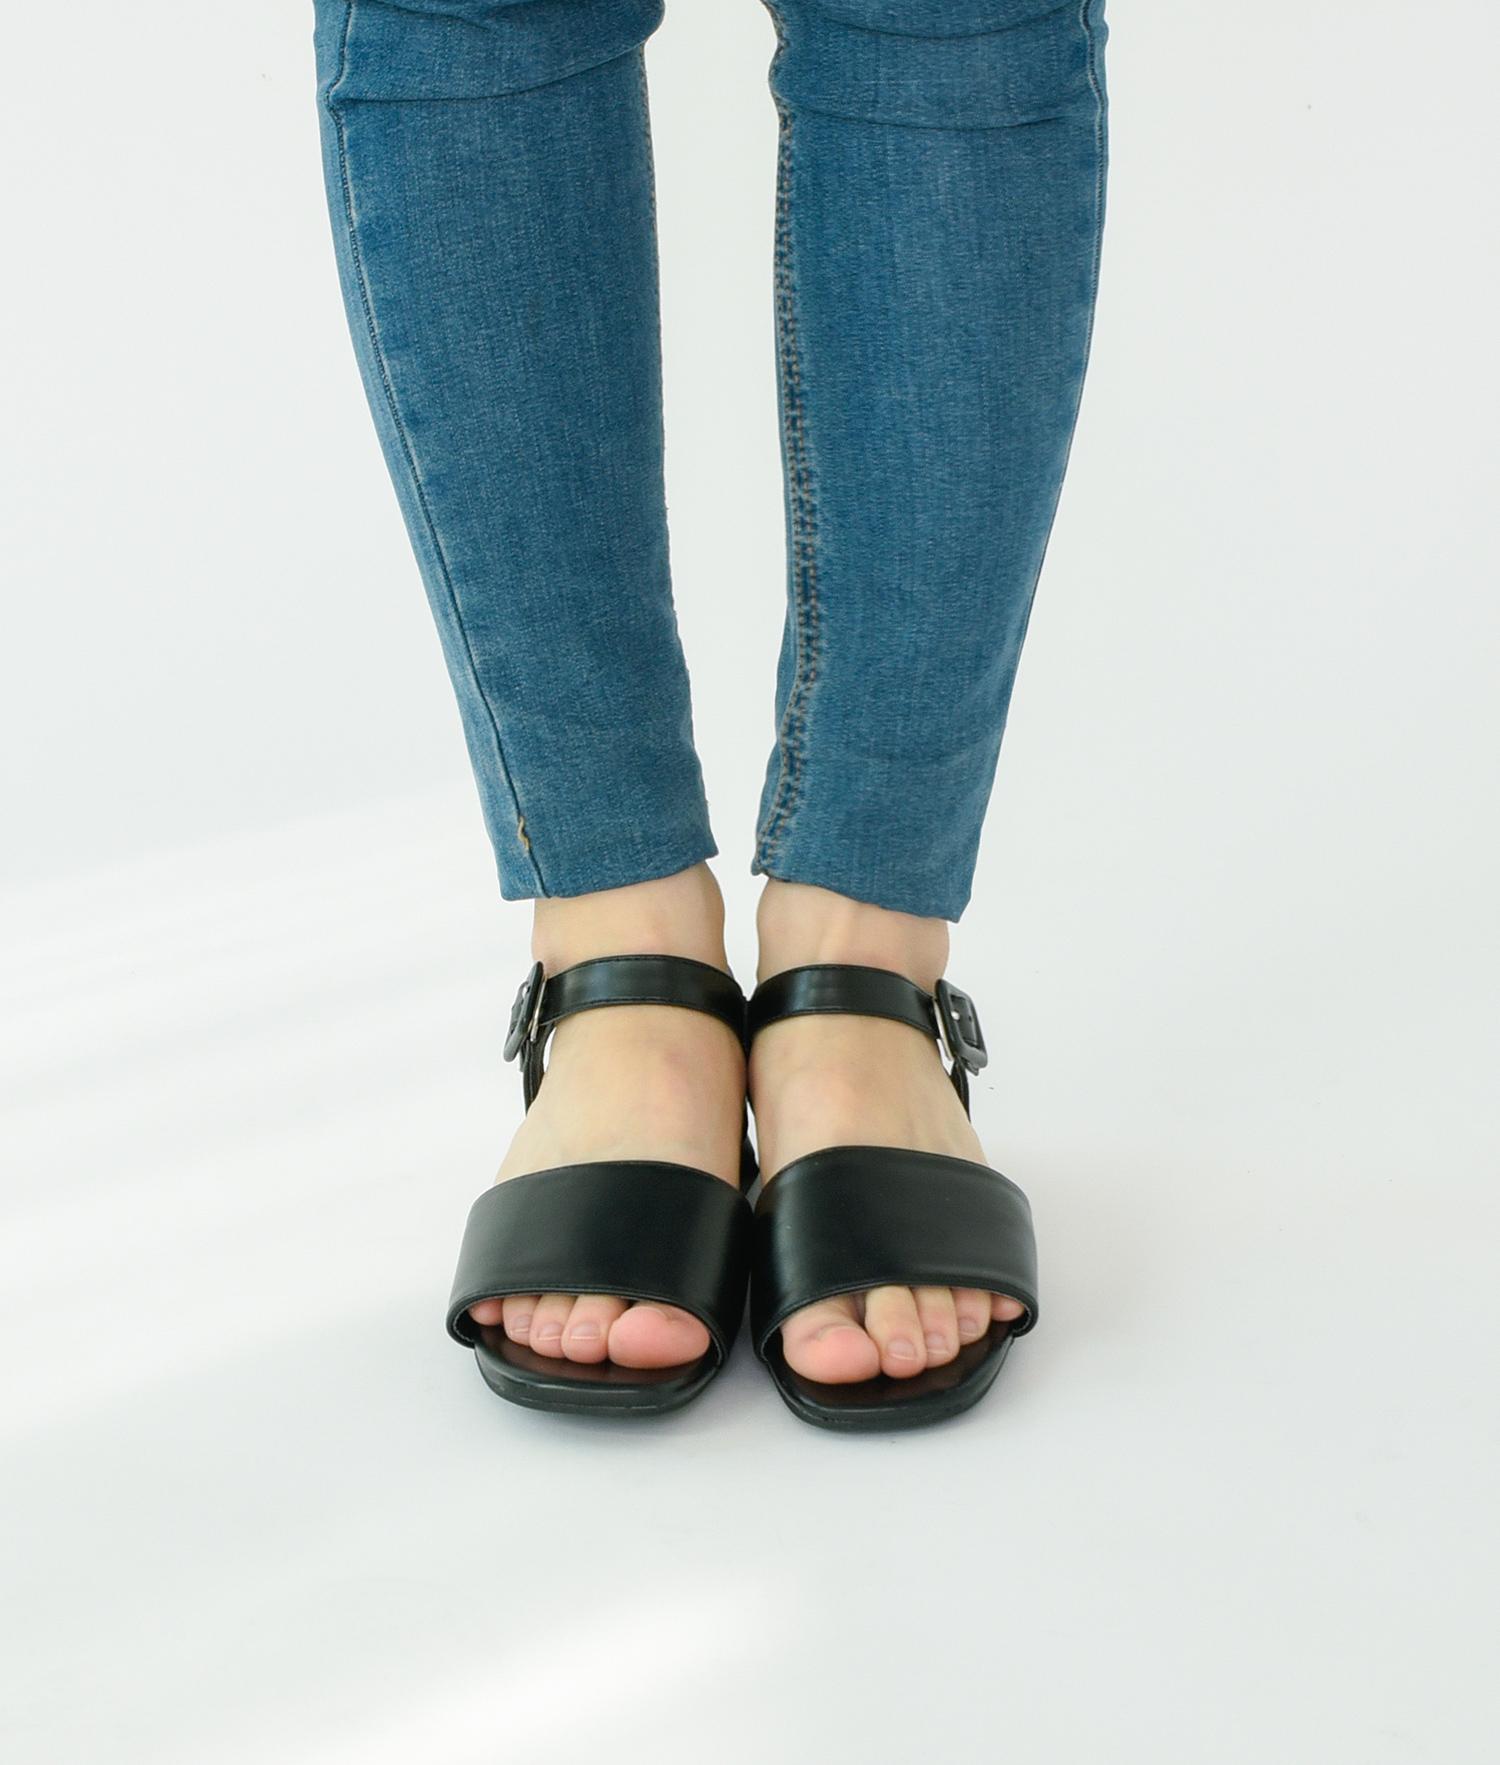 37f02655086 AnnaKastle Womens Vegan Leather Single Strap Sandals Black